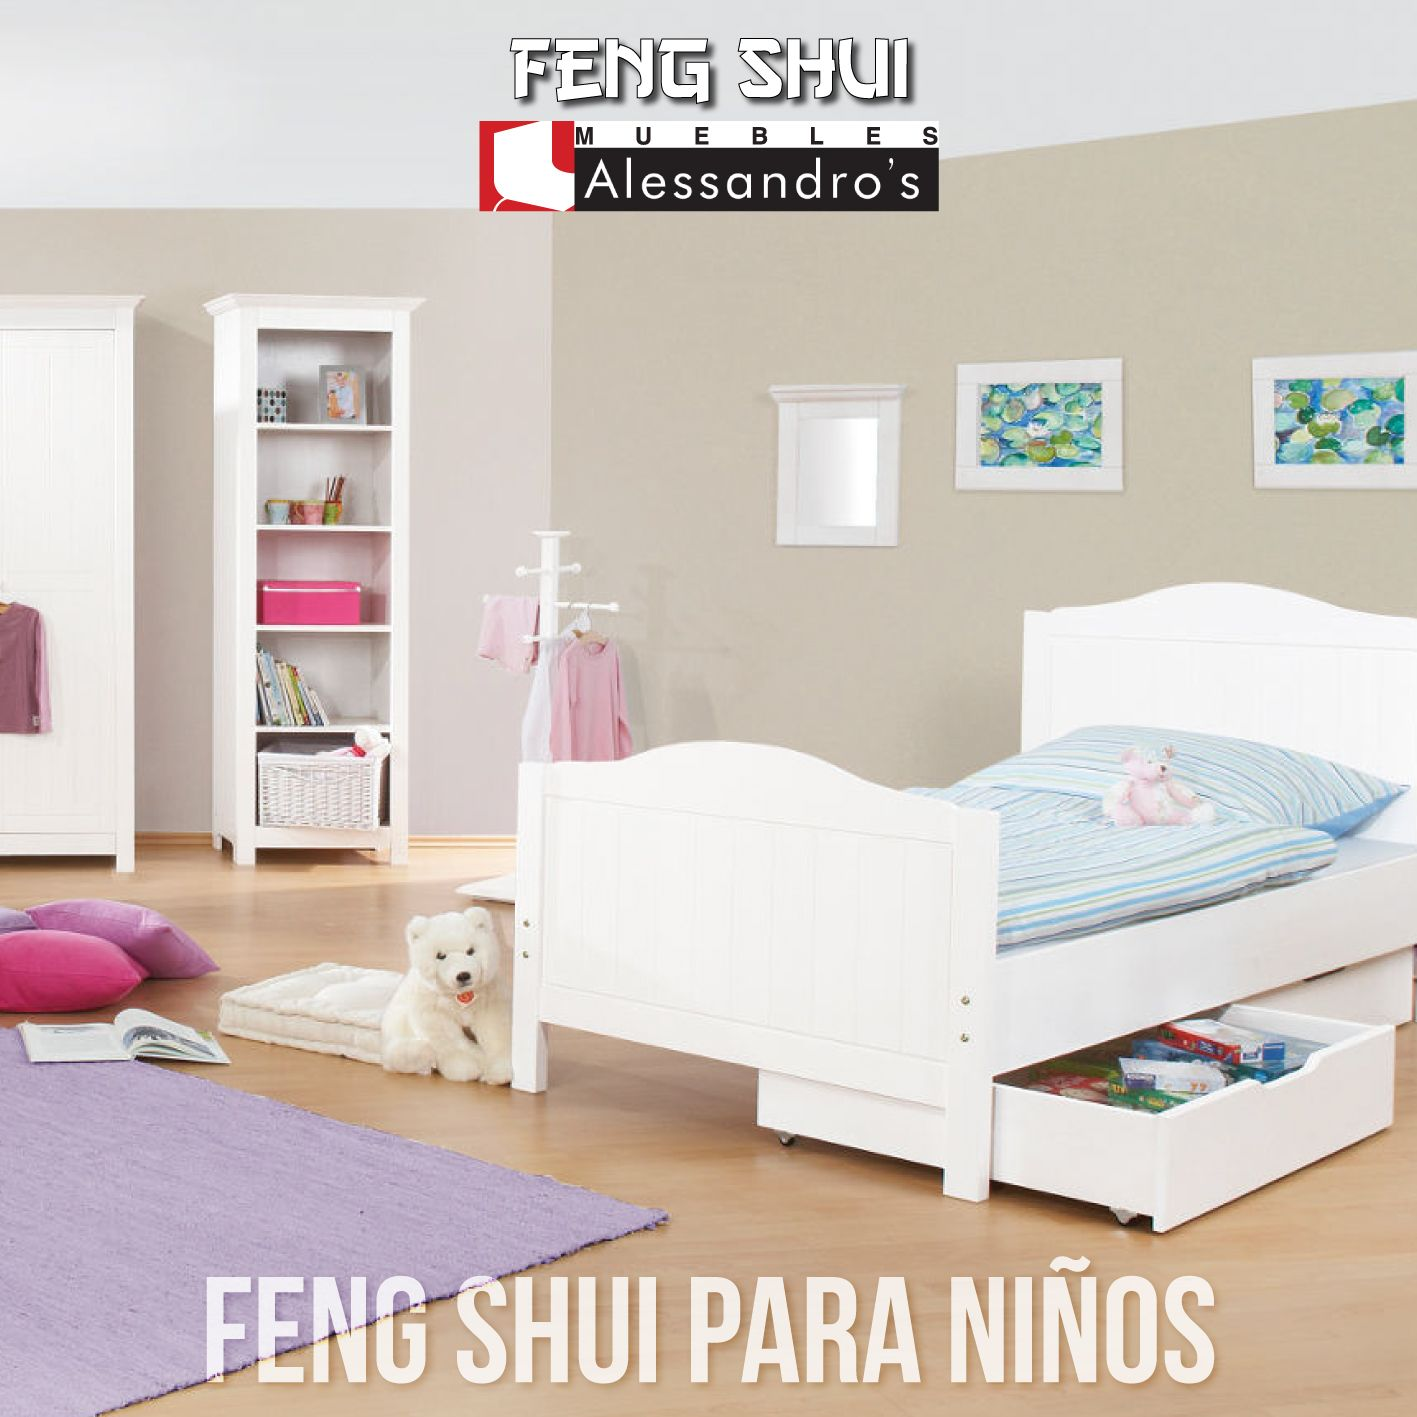 Para decorar el dormitorio de un ni o seg n el feng shui for Decoracion dormitorio matrimonial segun feng shui